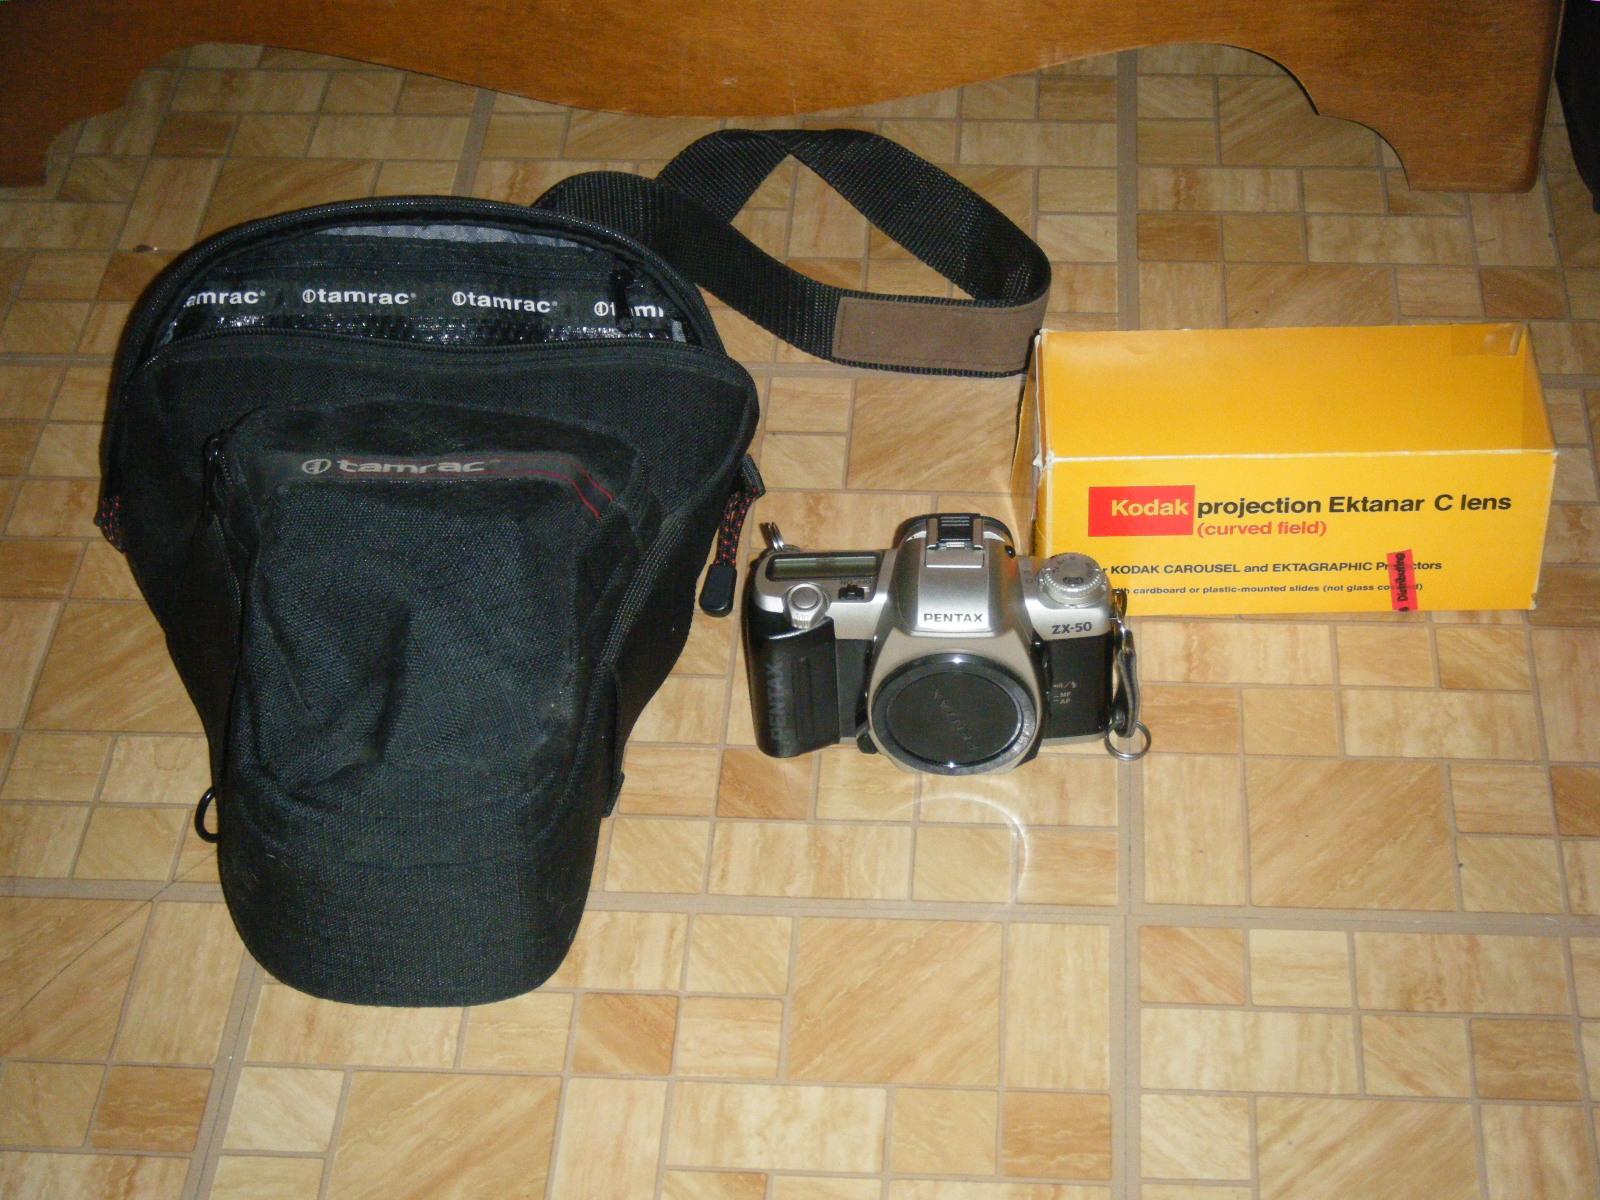 Pentax-ZX-50 camera